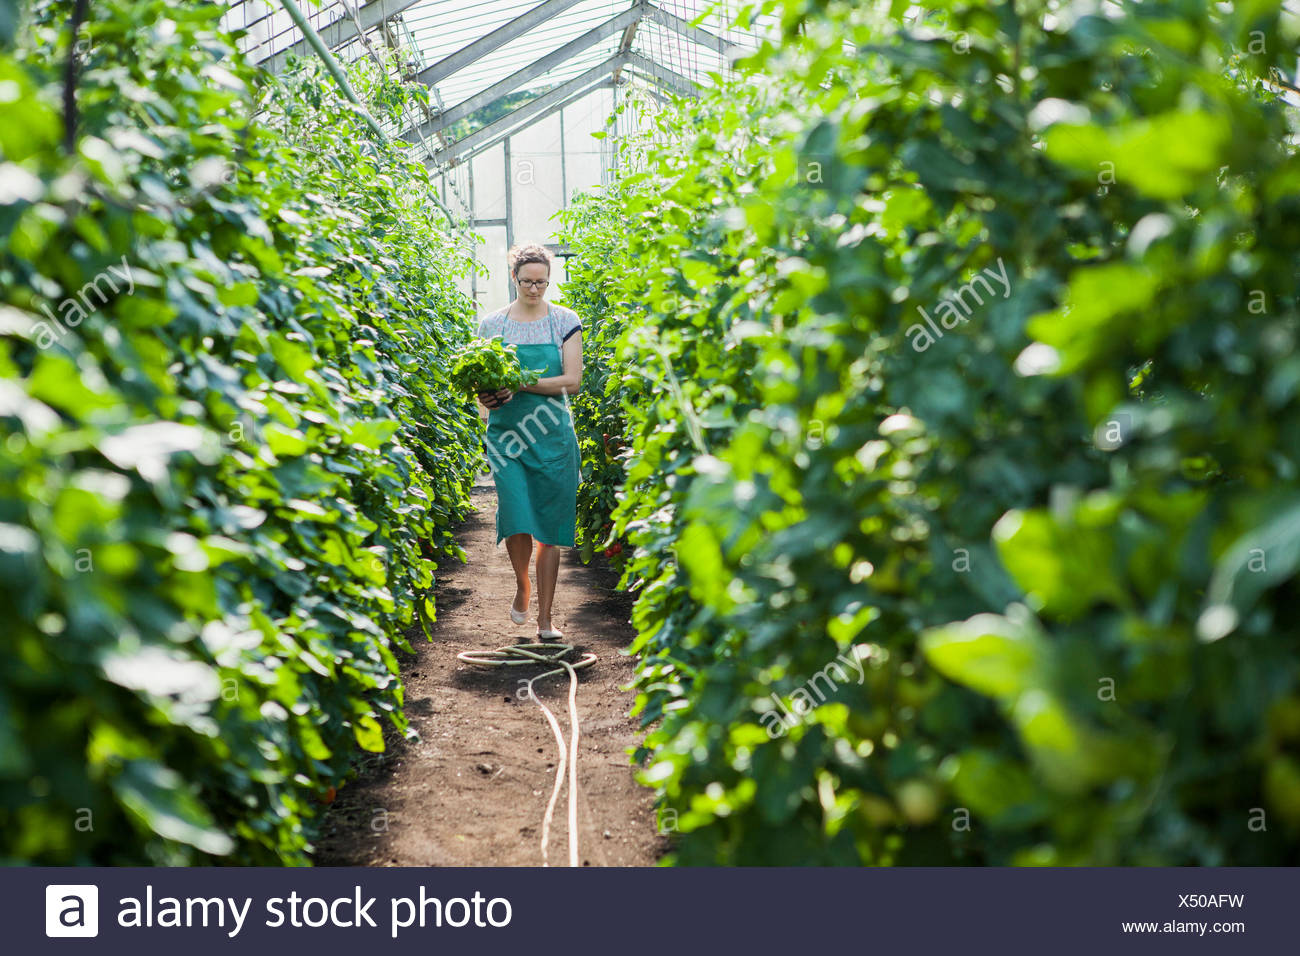 Female gardener among tomato plants in greenhouse - Stock Image